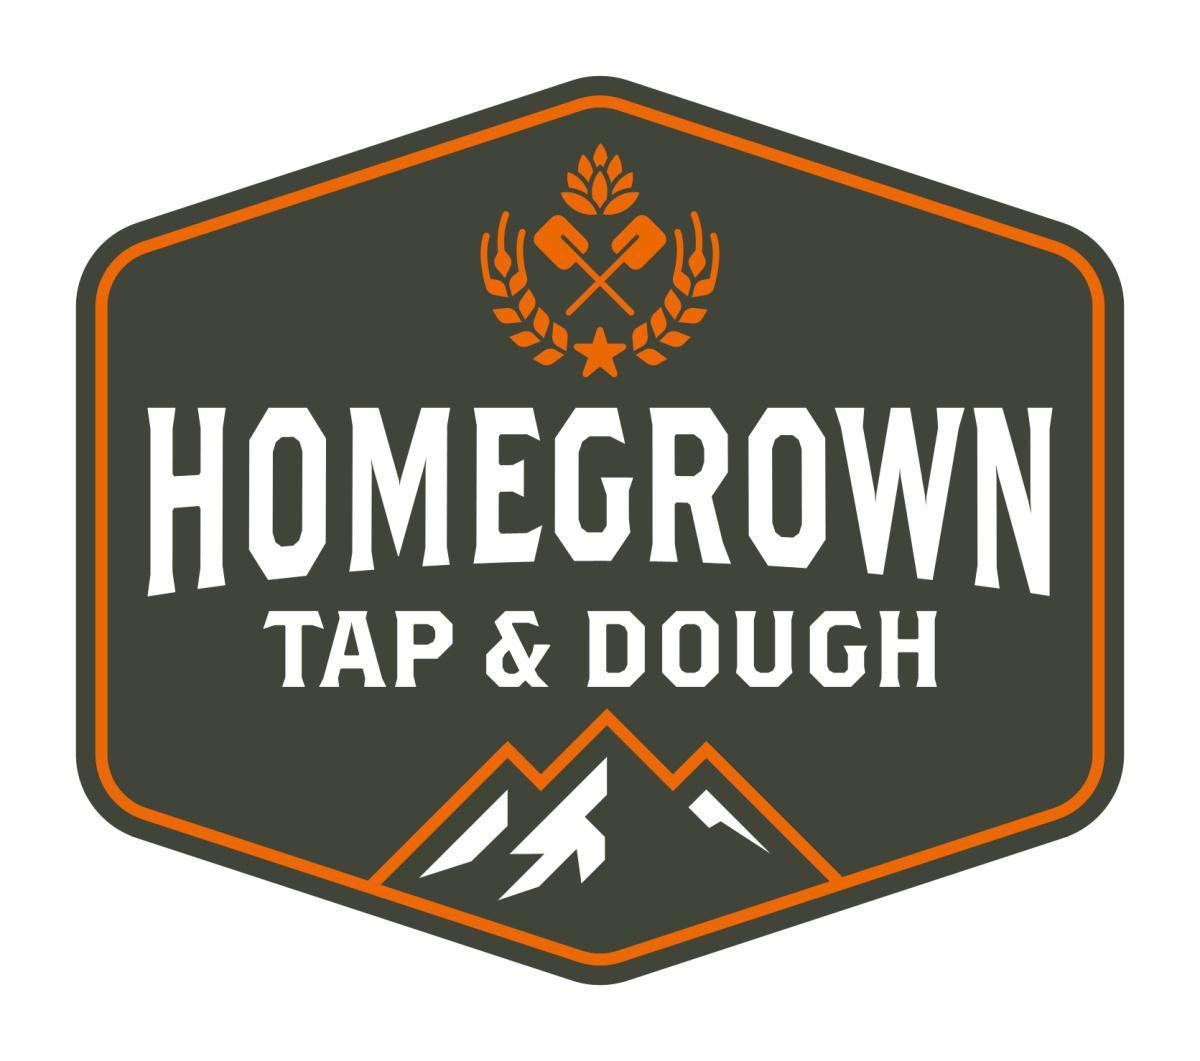 Homegrown Tap & Dough (3PM-6PM & 9PM-10PM)